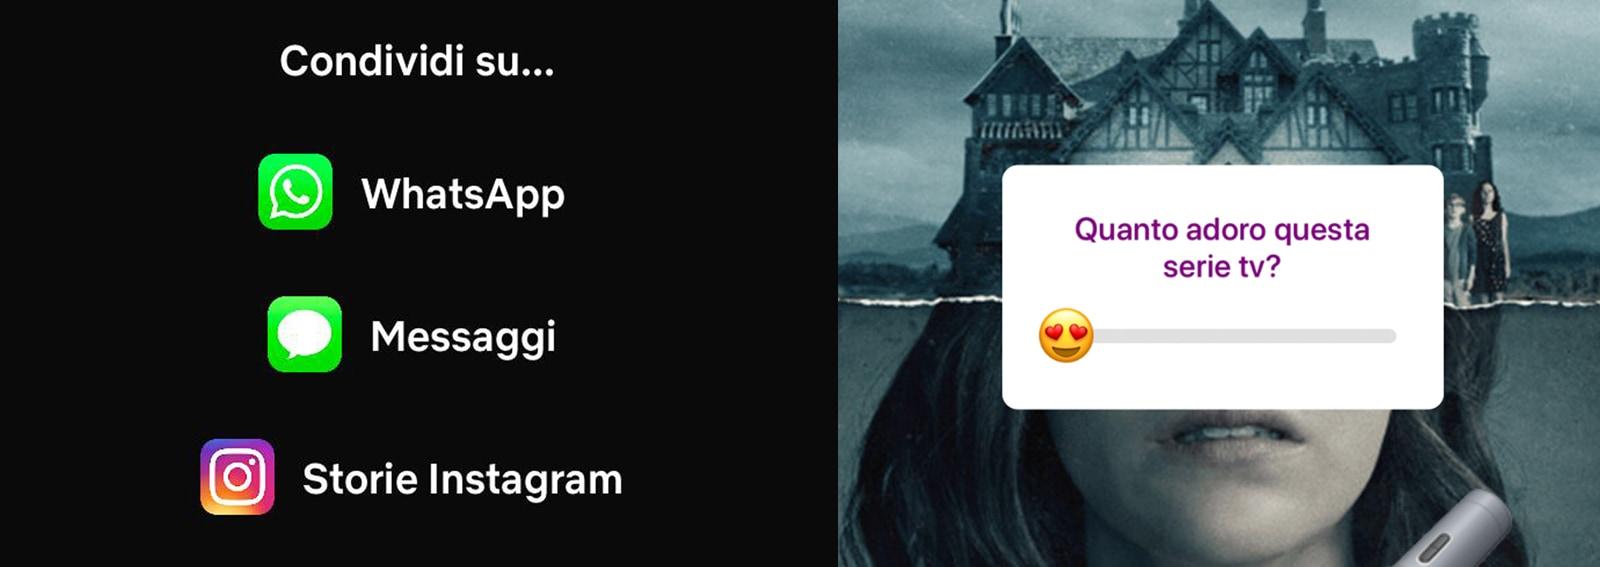 instagram netflix condivisione